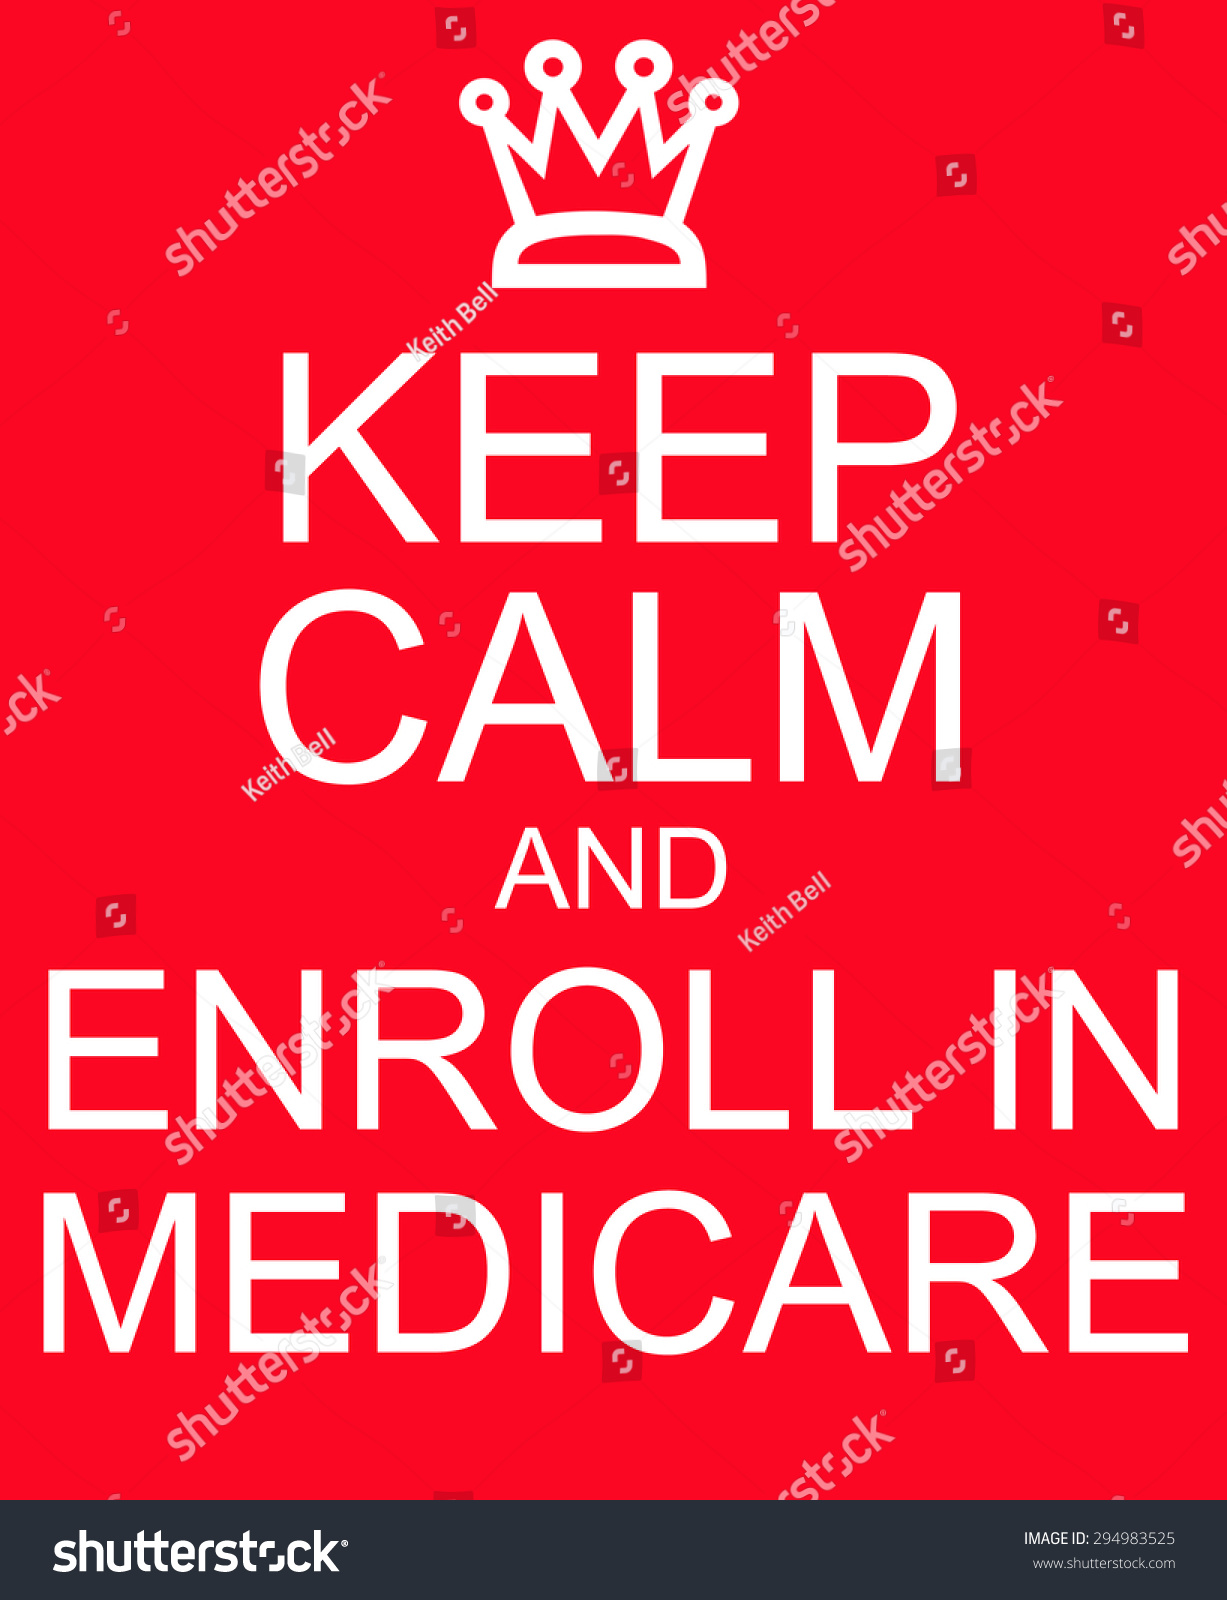 keep calm enroll medicare red sign stock illustration 294983525